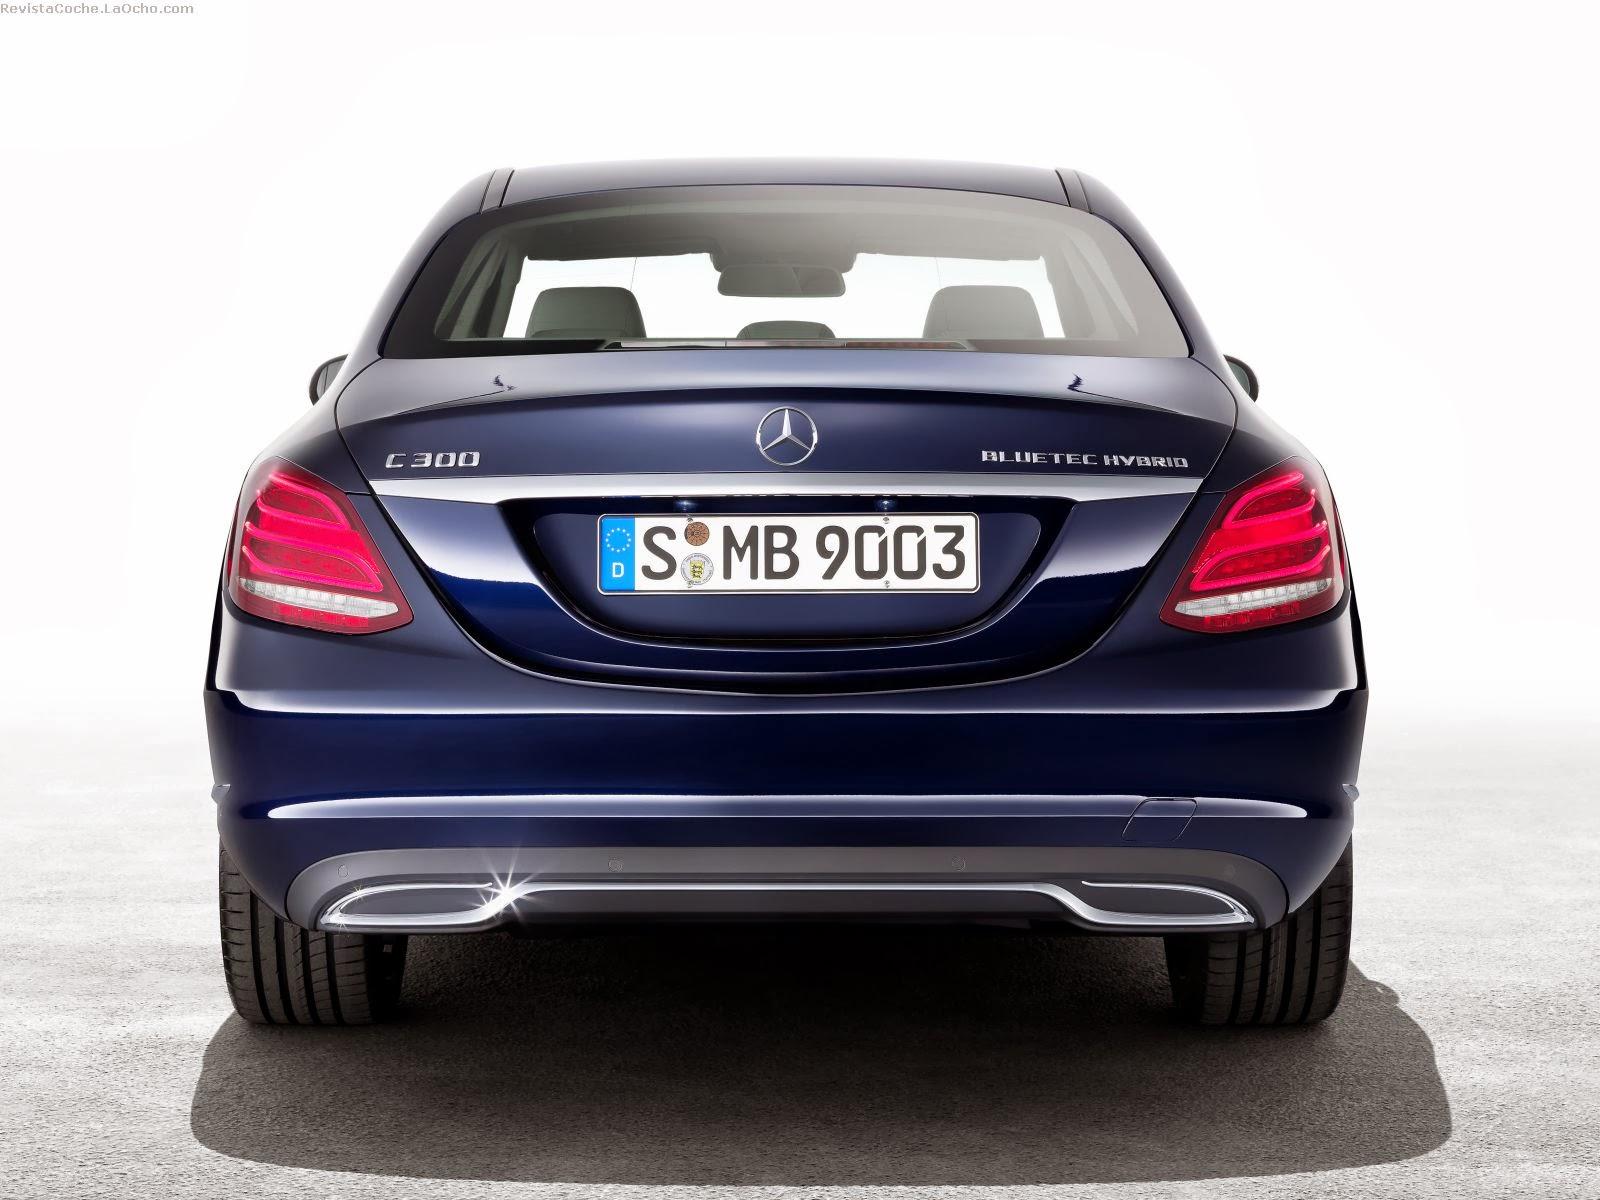 Revista Coche: Nuevo Mercedes-Benz Clase C 2014